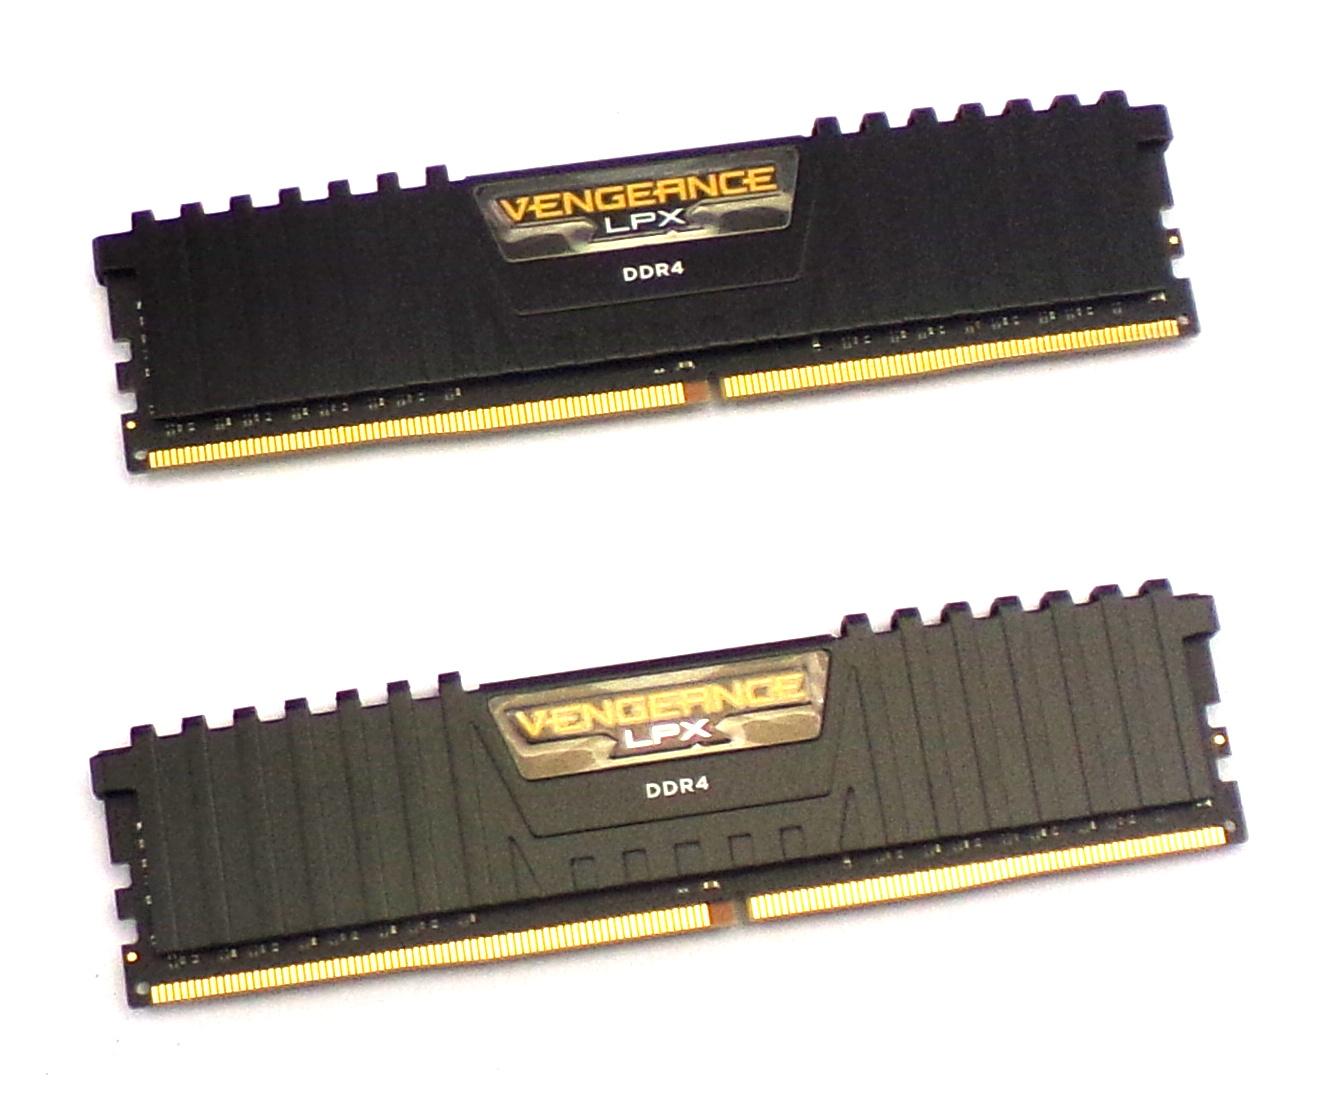 Corsair CM4X4GF2400Z16K4 8GB VENGEANCE LPX (2x 4gb) 2400MHz DDR4 Memory